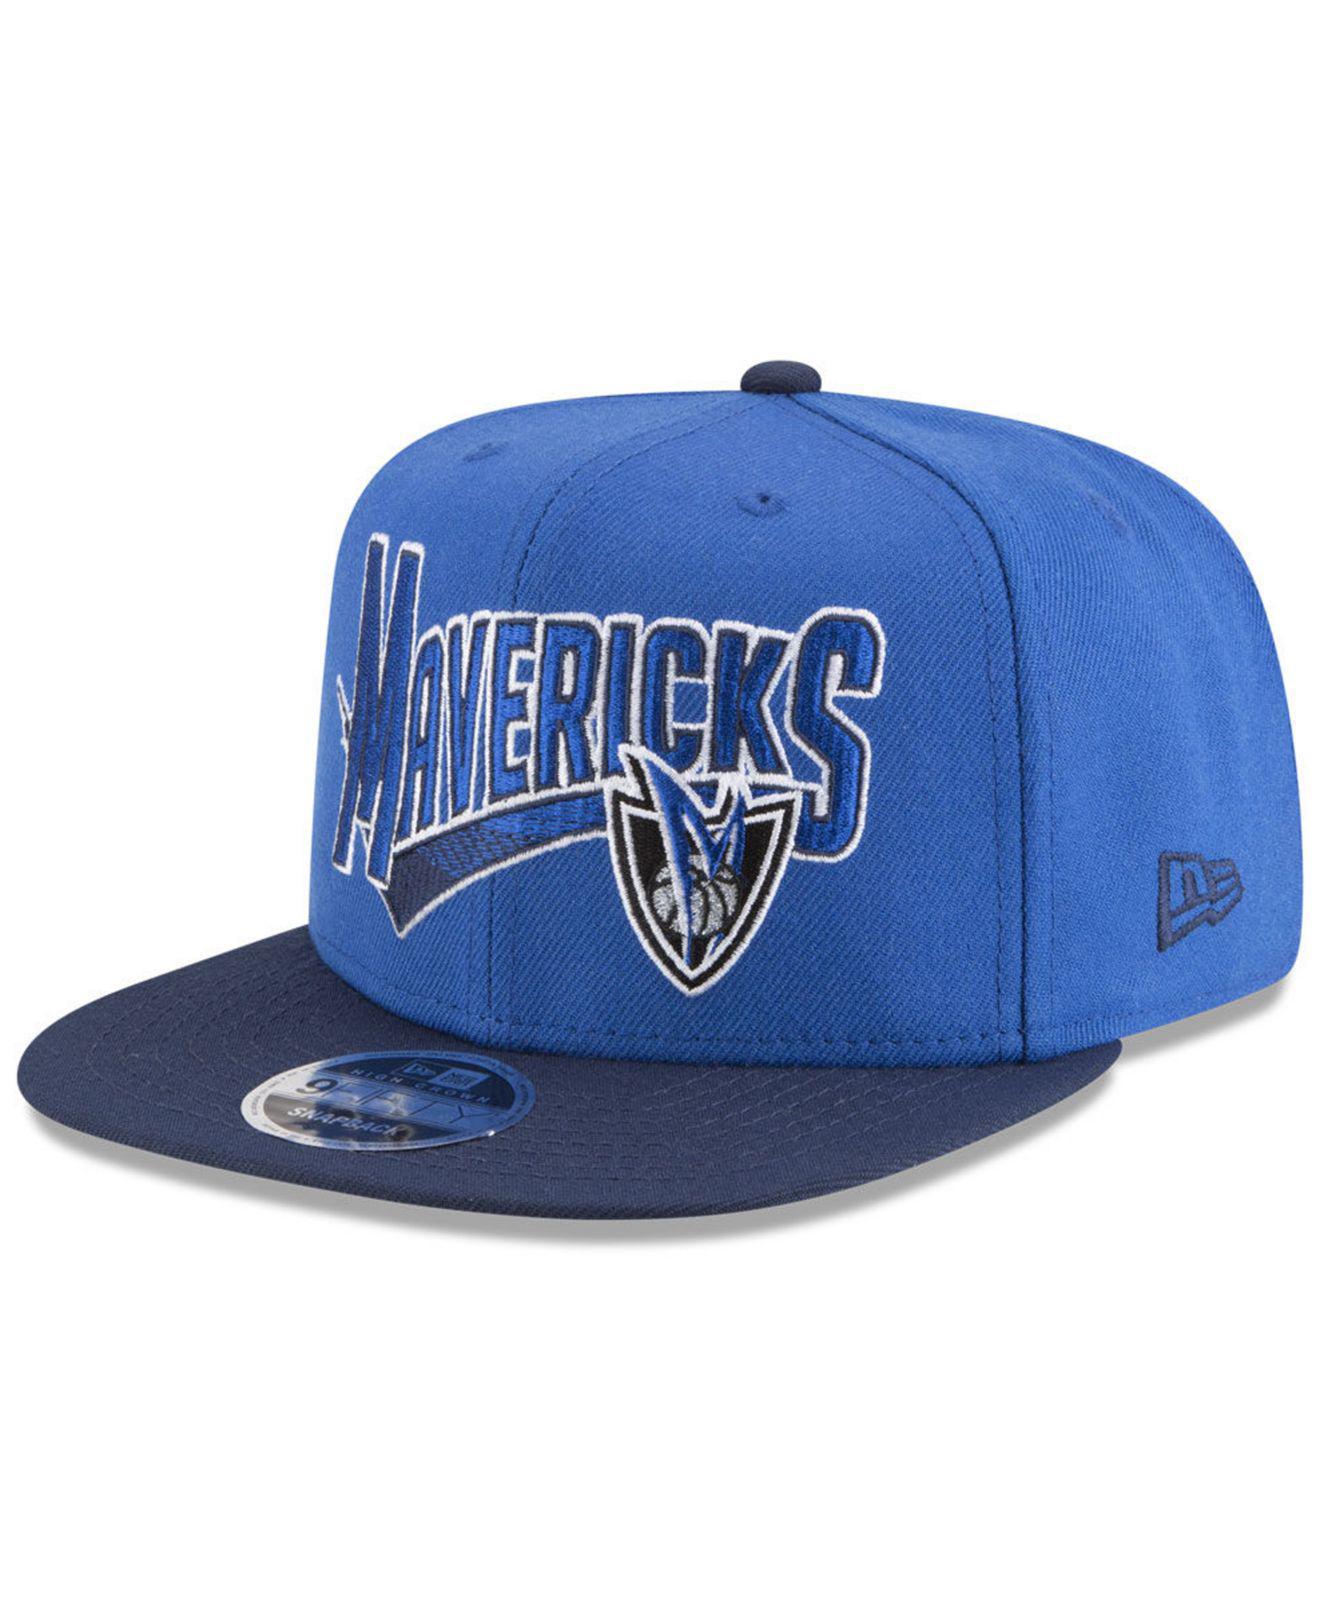 new arrival f8fe0 c770d KTZ Dallas Mavericks Retro Tail 9fifty Snapback Cap in Blue for Men ...